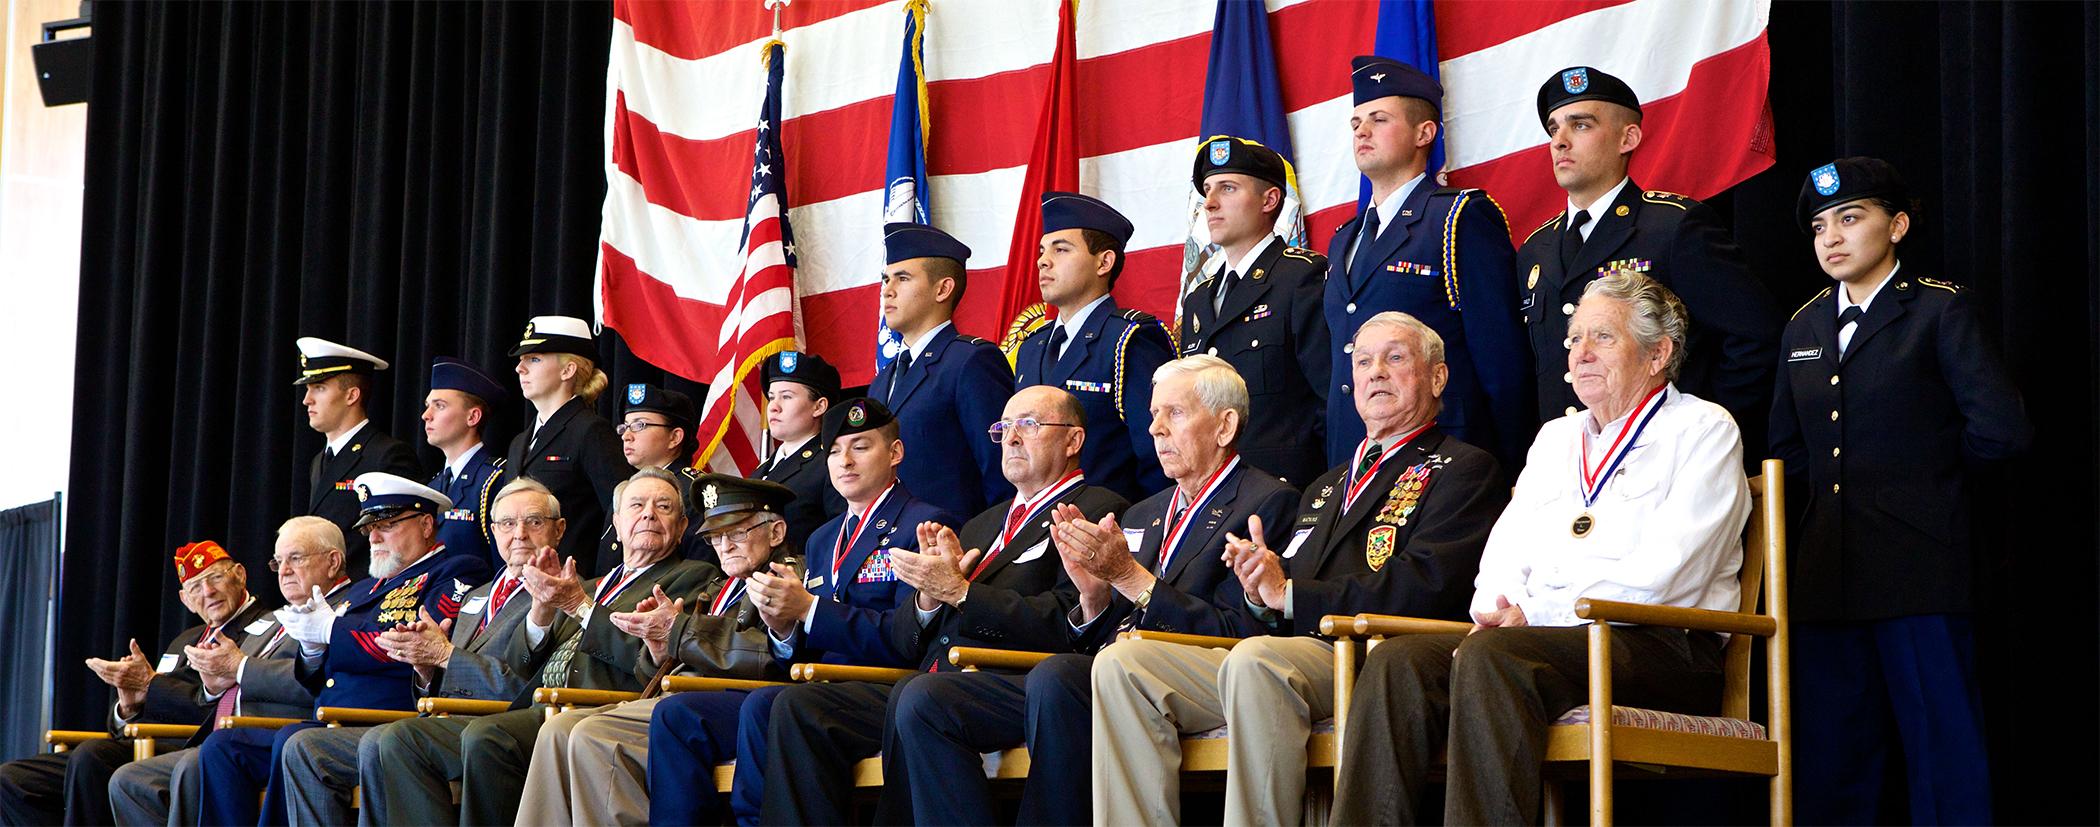 VeteransDayMARQUEE